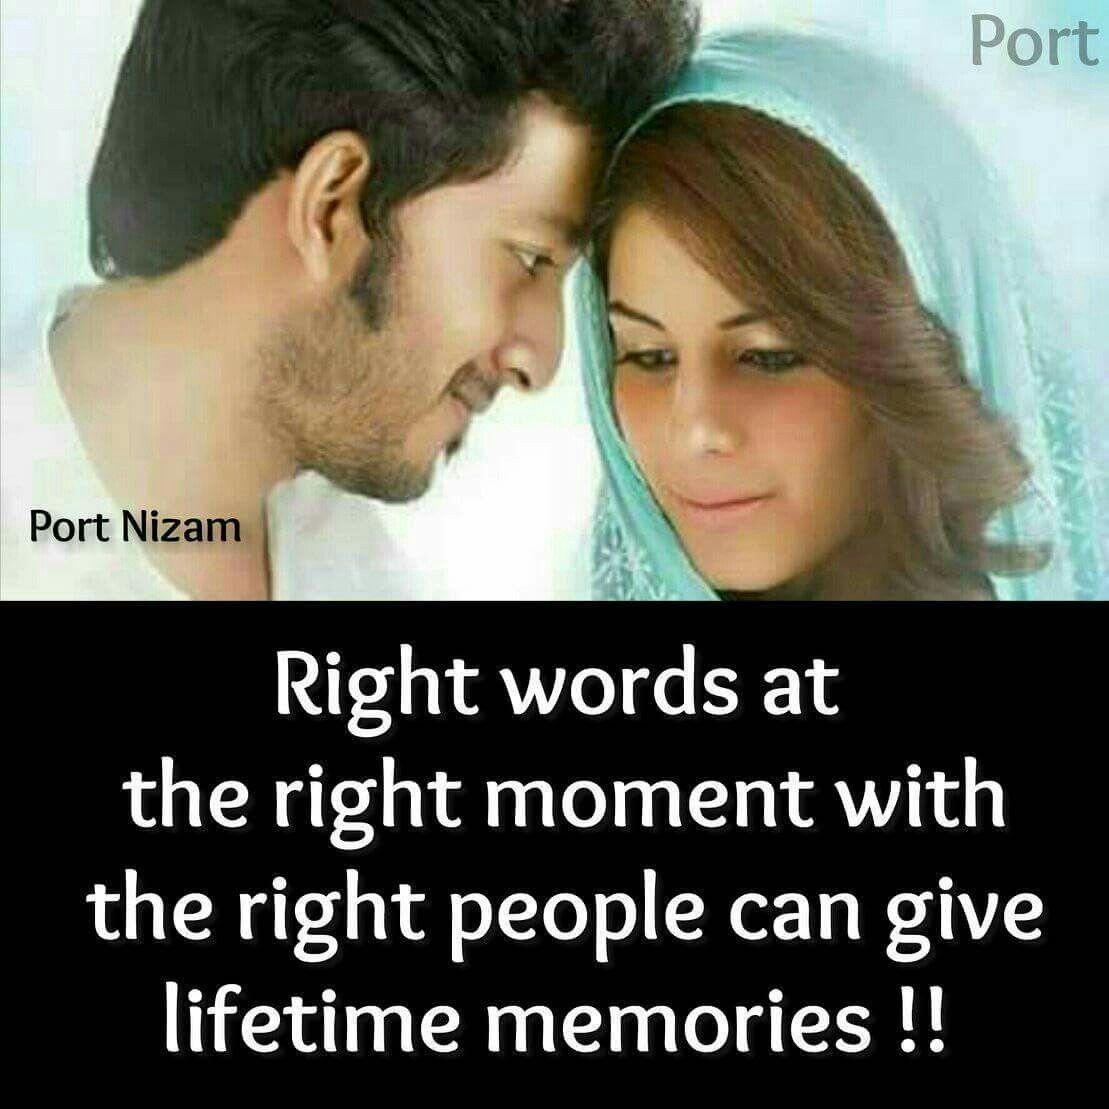 Quotes Hindi Quotes Qoutes Romantic Quotes Love Quotes Funny Quotes Favorite Movie Quotes Indian Movies Song Lyrics